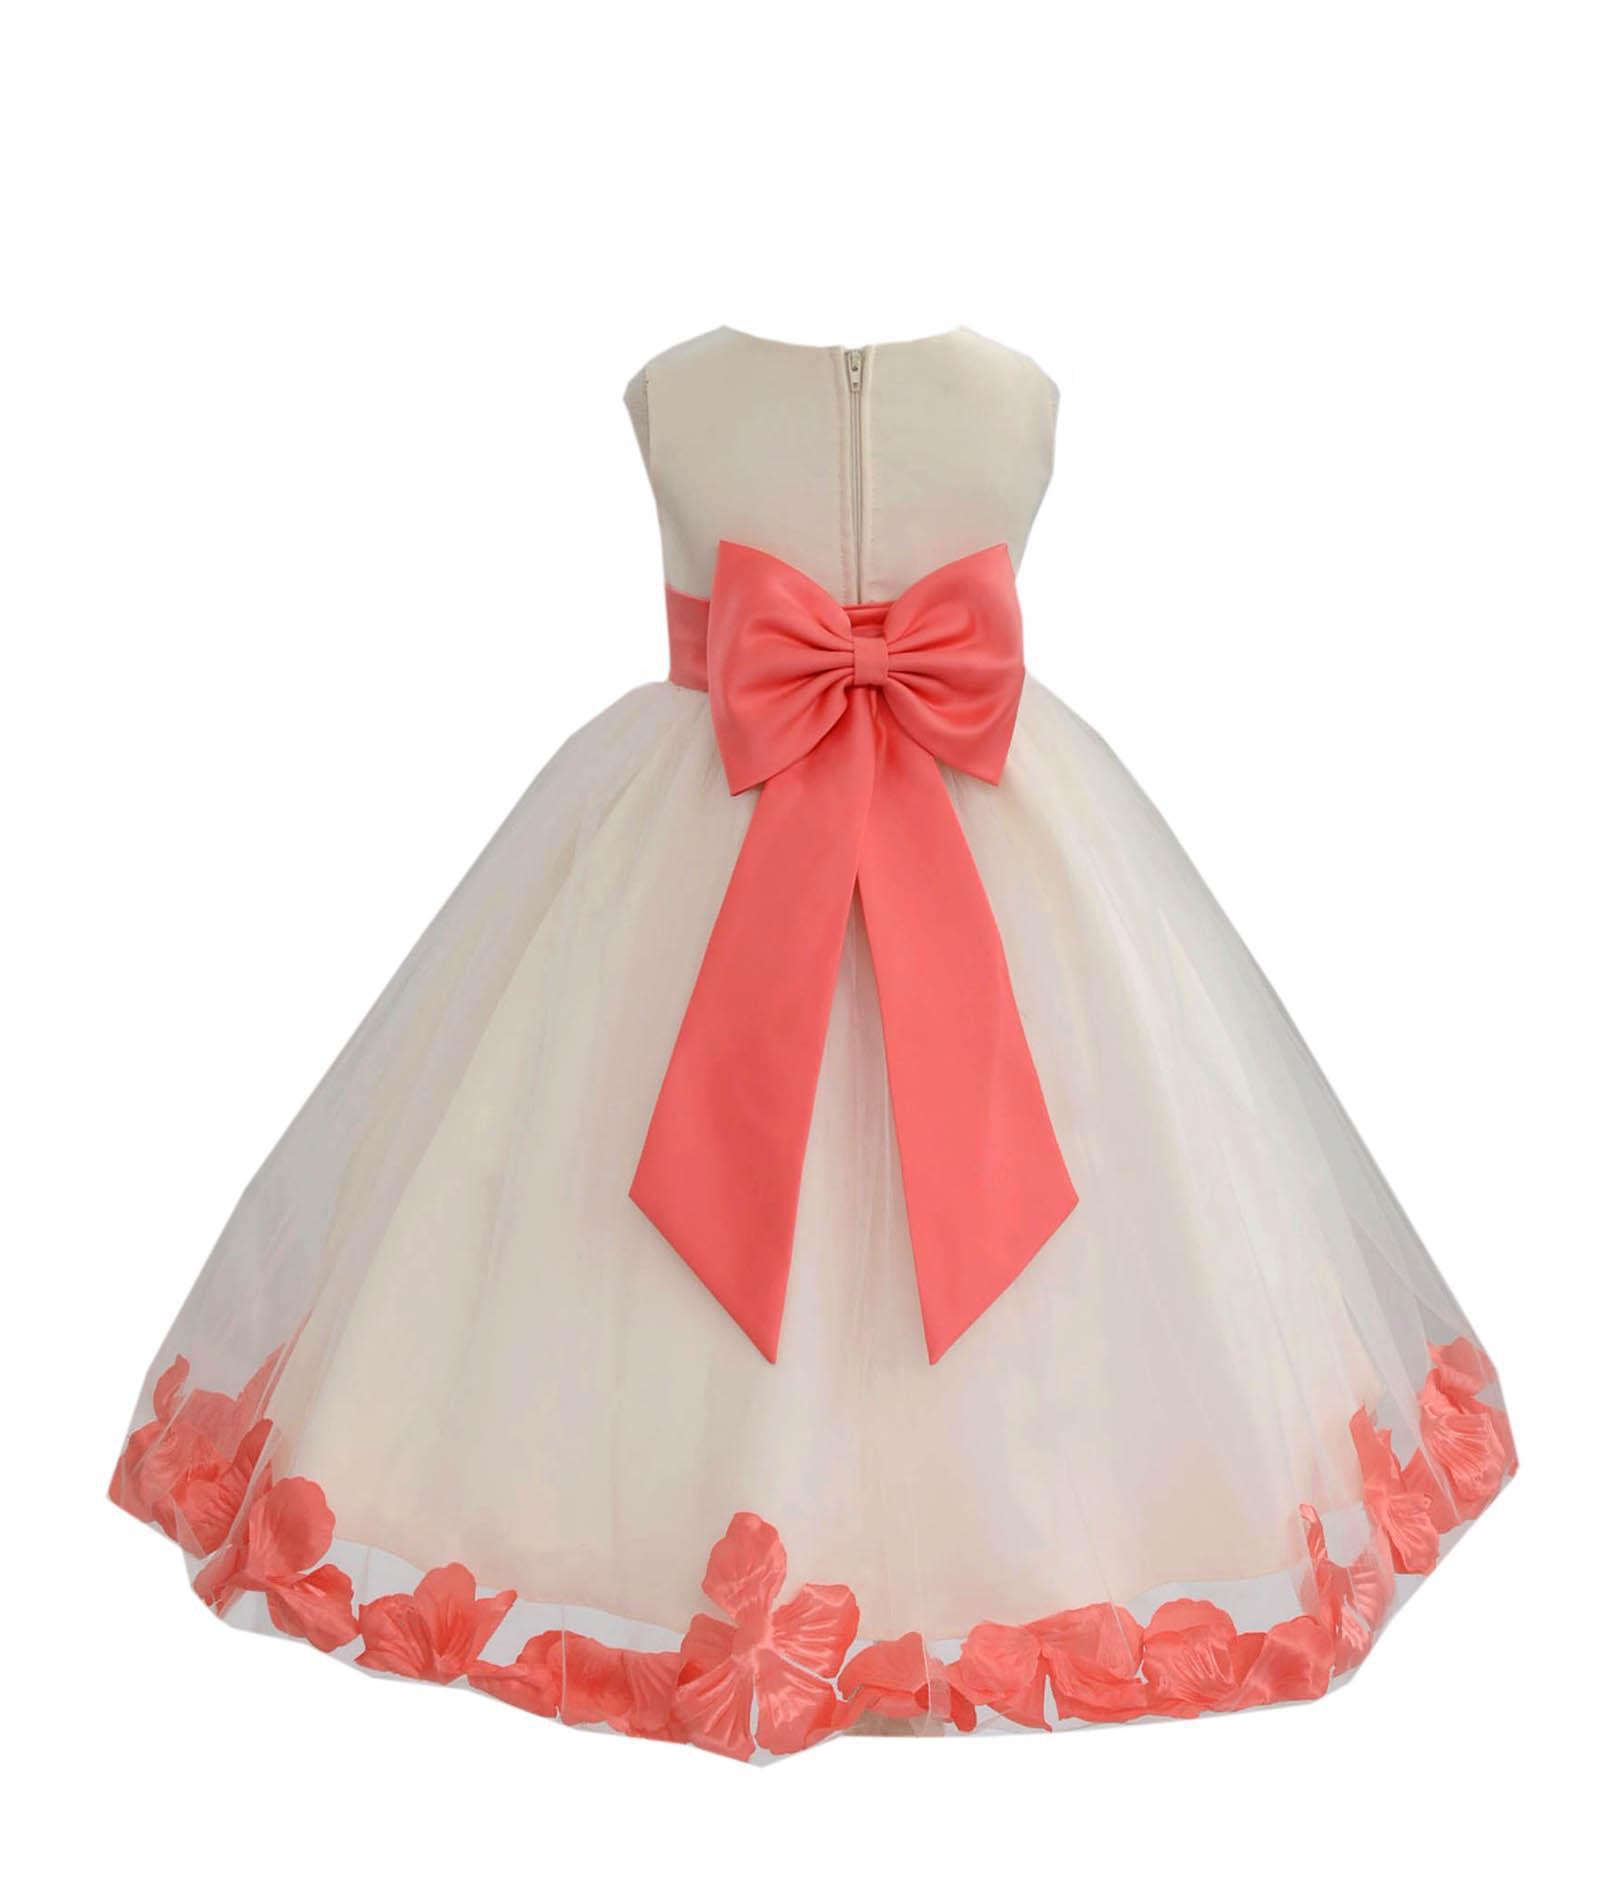 Rose Petals Ivory Tulle Junior Flower Girl Dress Formal Recital Dresses 302T S